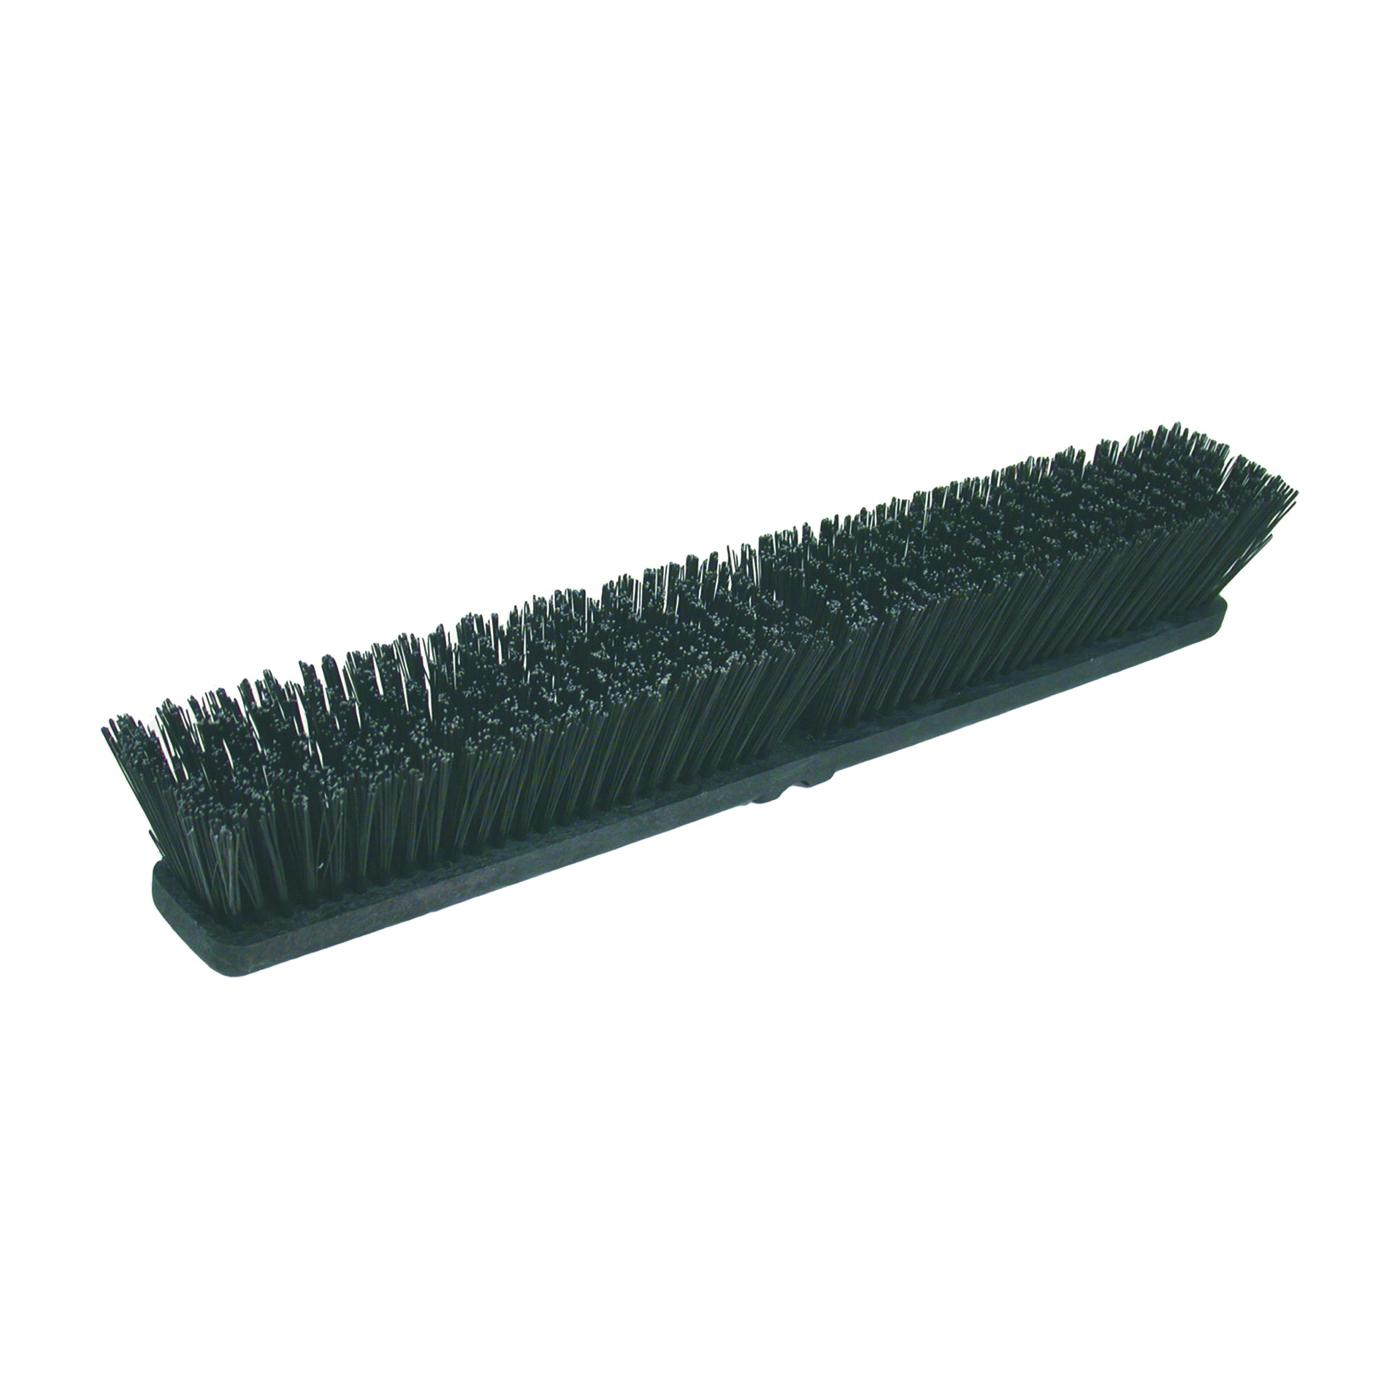 Picture of BIRDWELL 2027-12 Broom Head Threaded, Threaded, 3 in L Trim, Polystyrene Bristle, Black